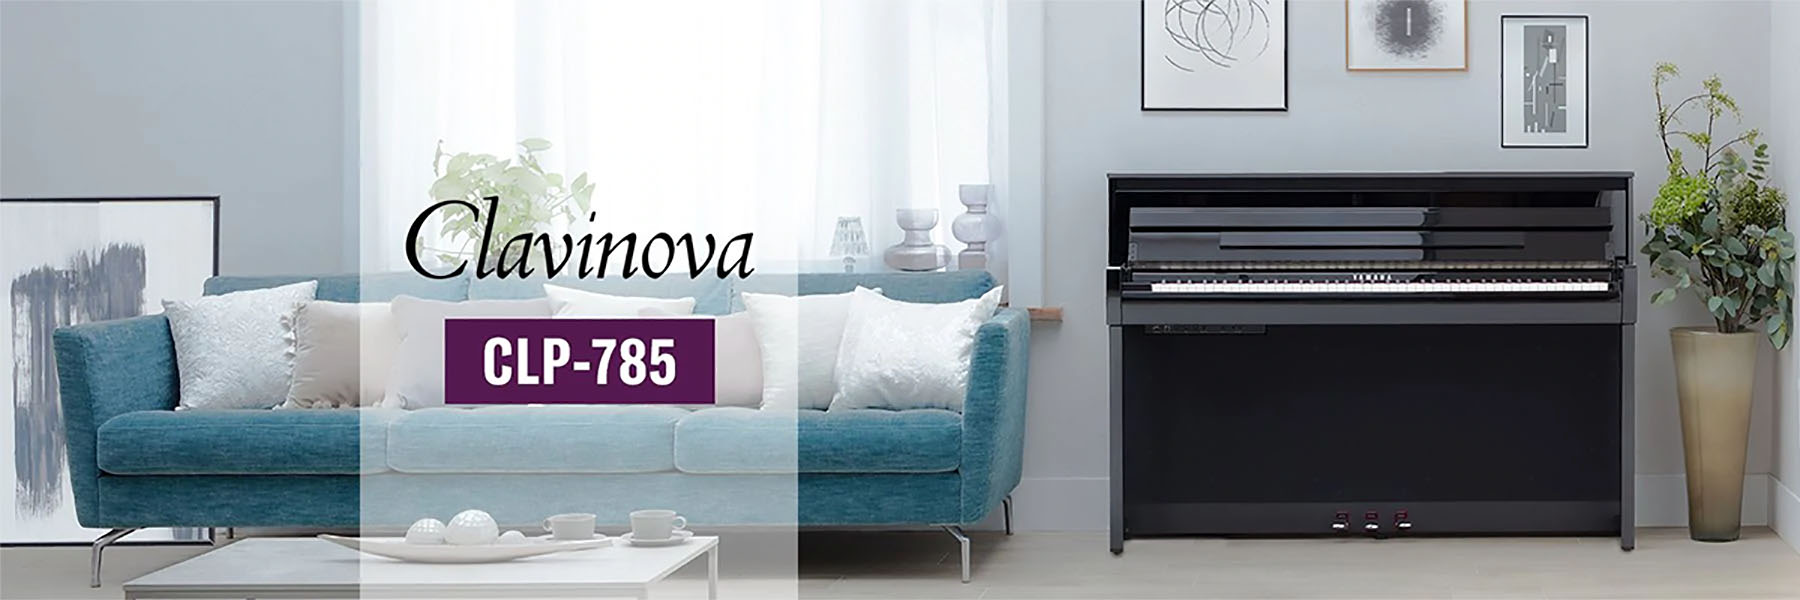 Yamaha CLP-785 Digital Piano